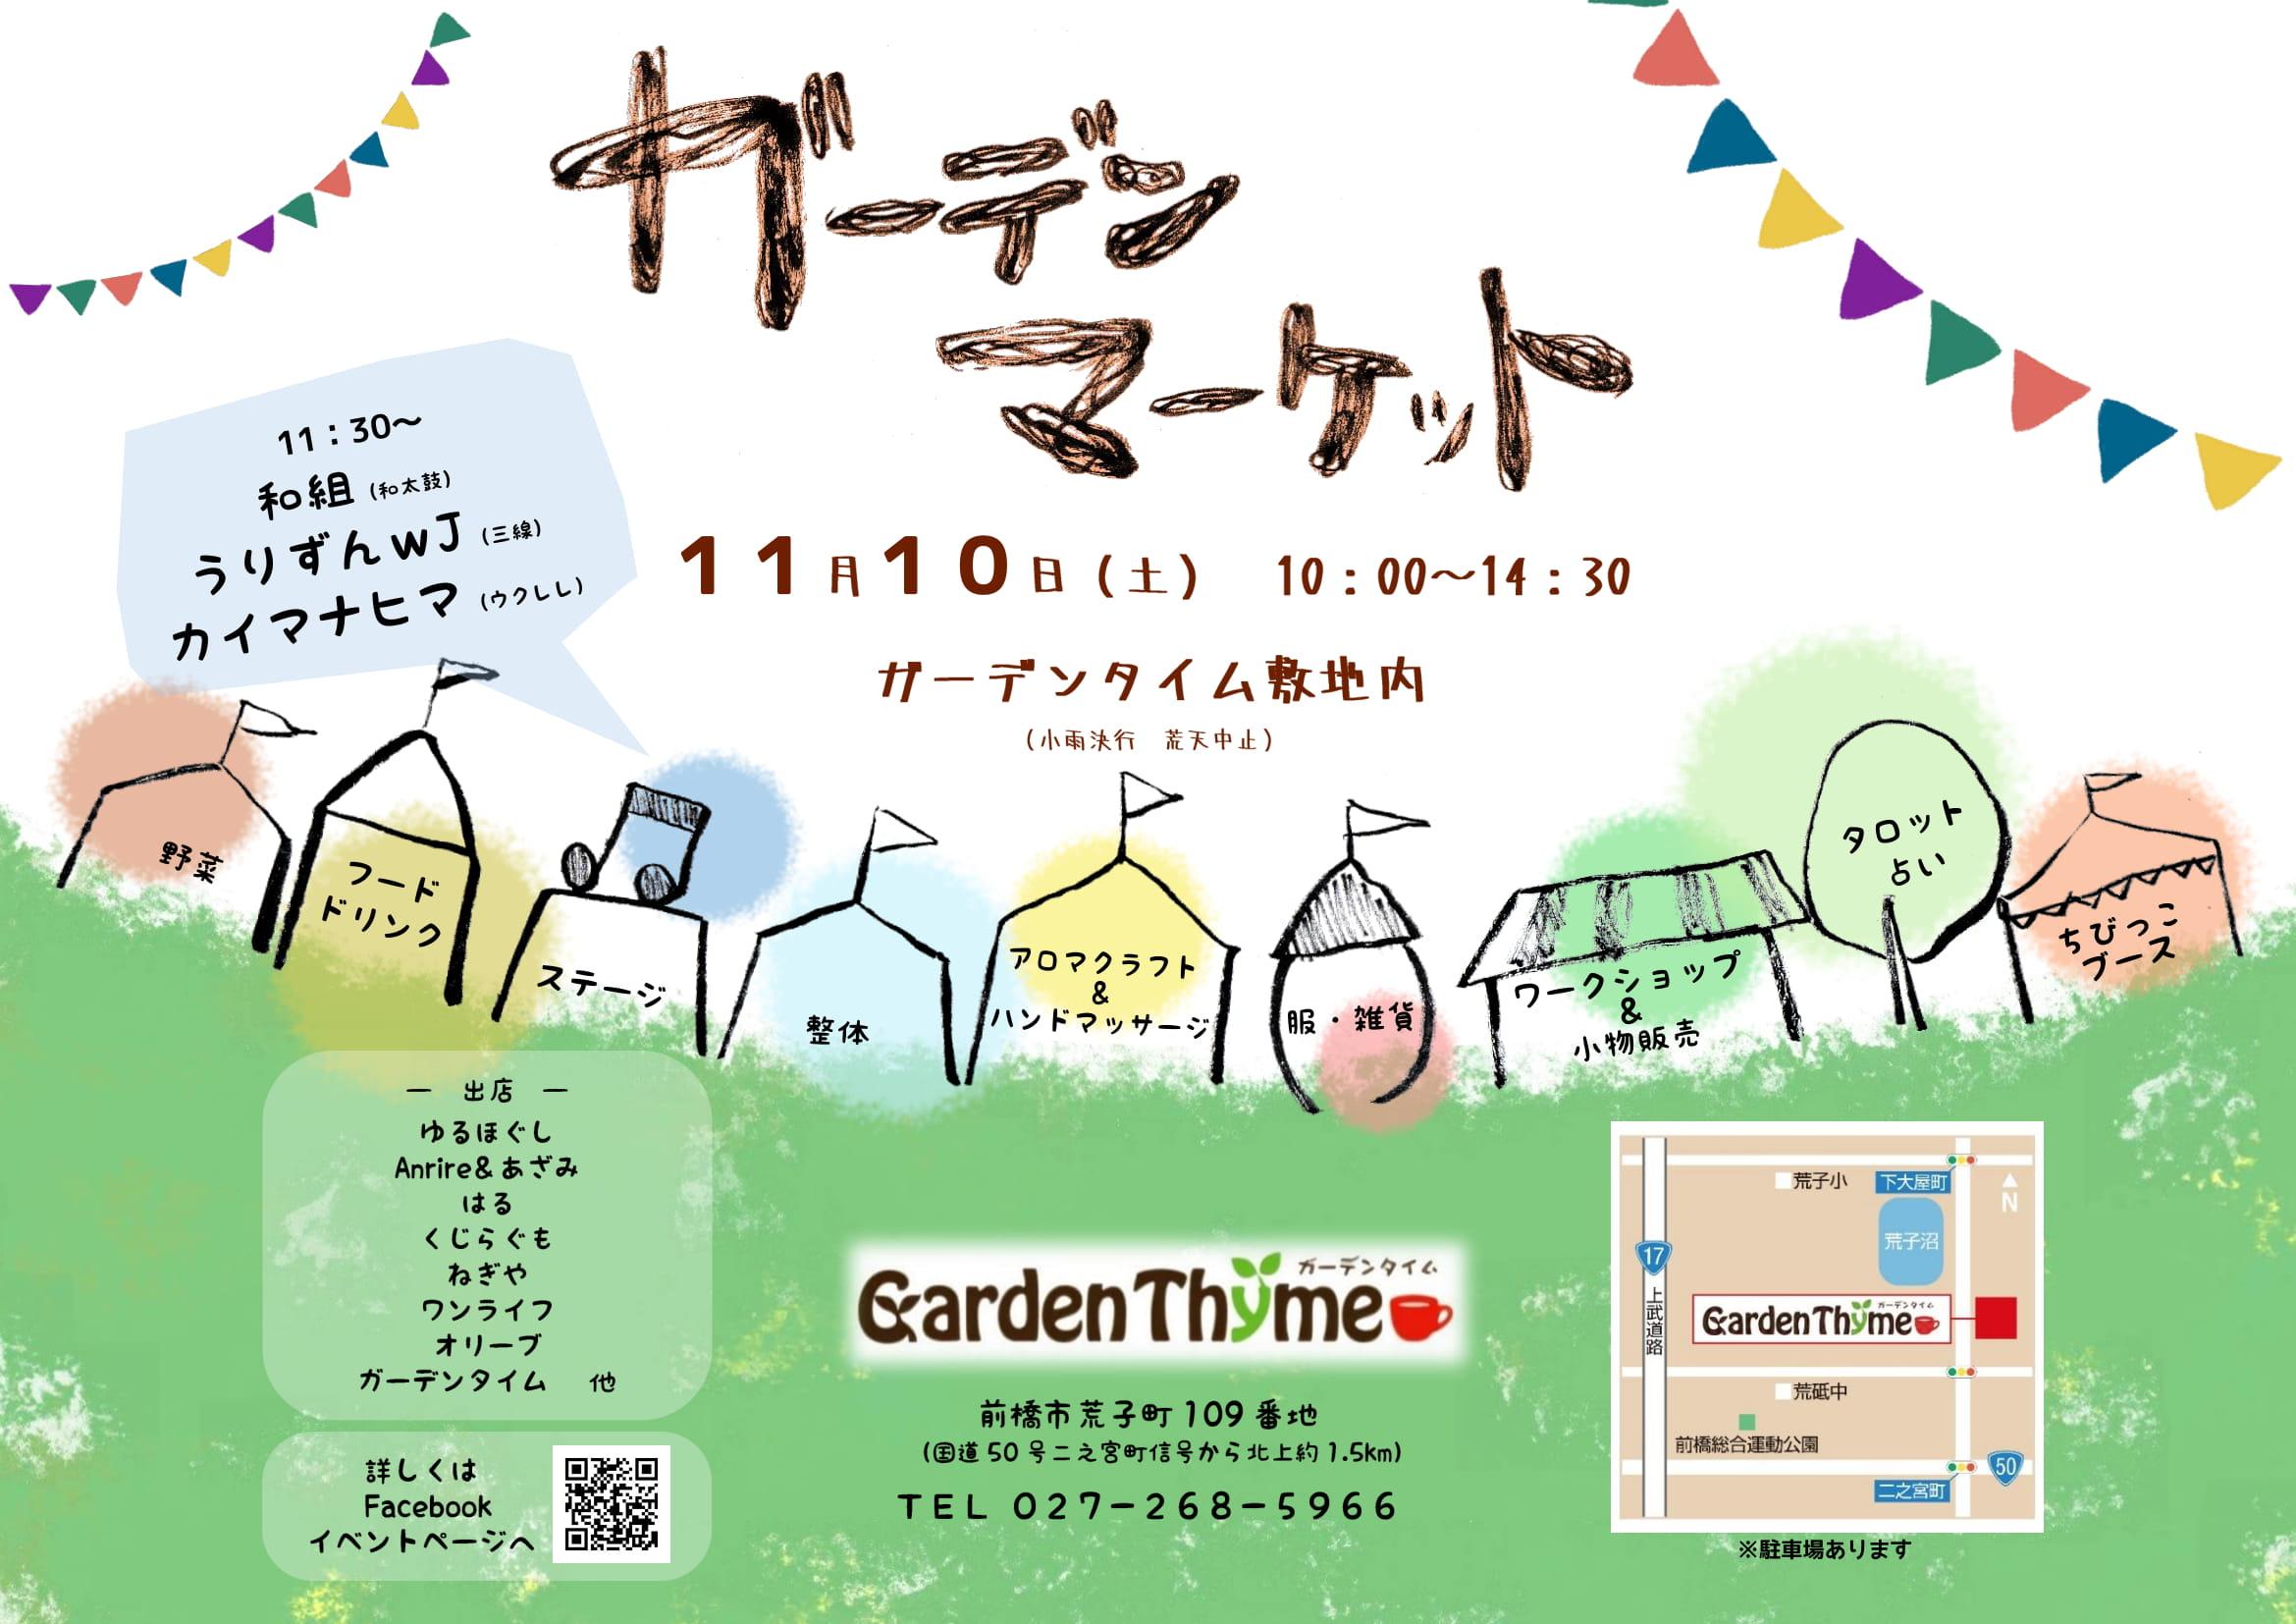 〇H3011 ガーデンマーケットチラシ